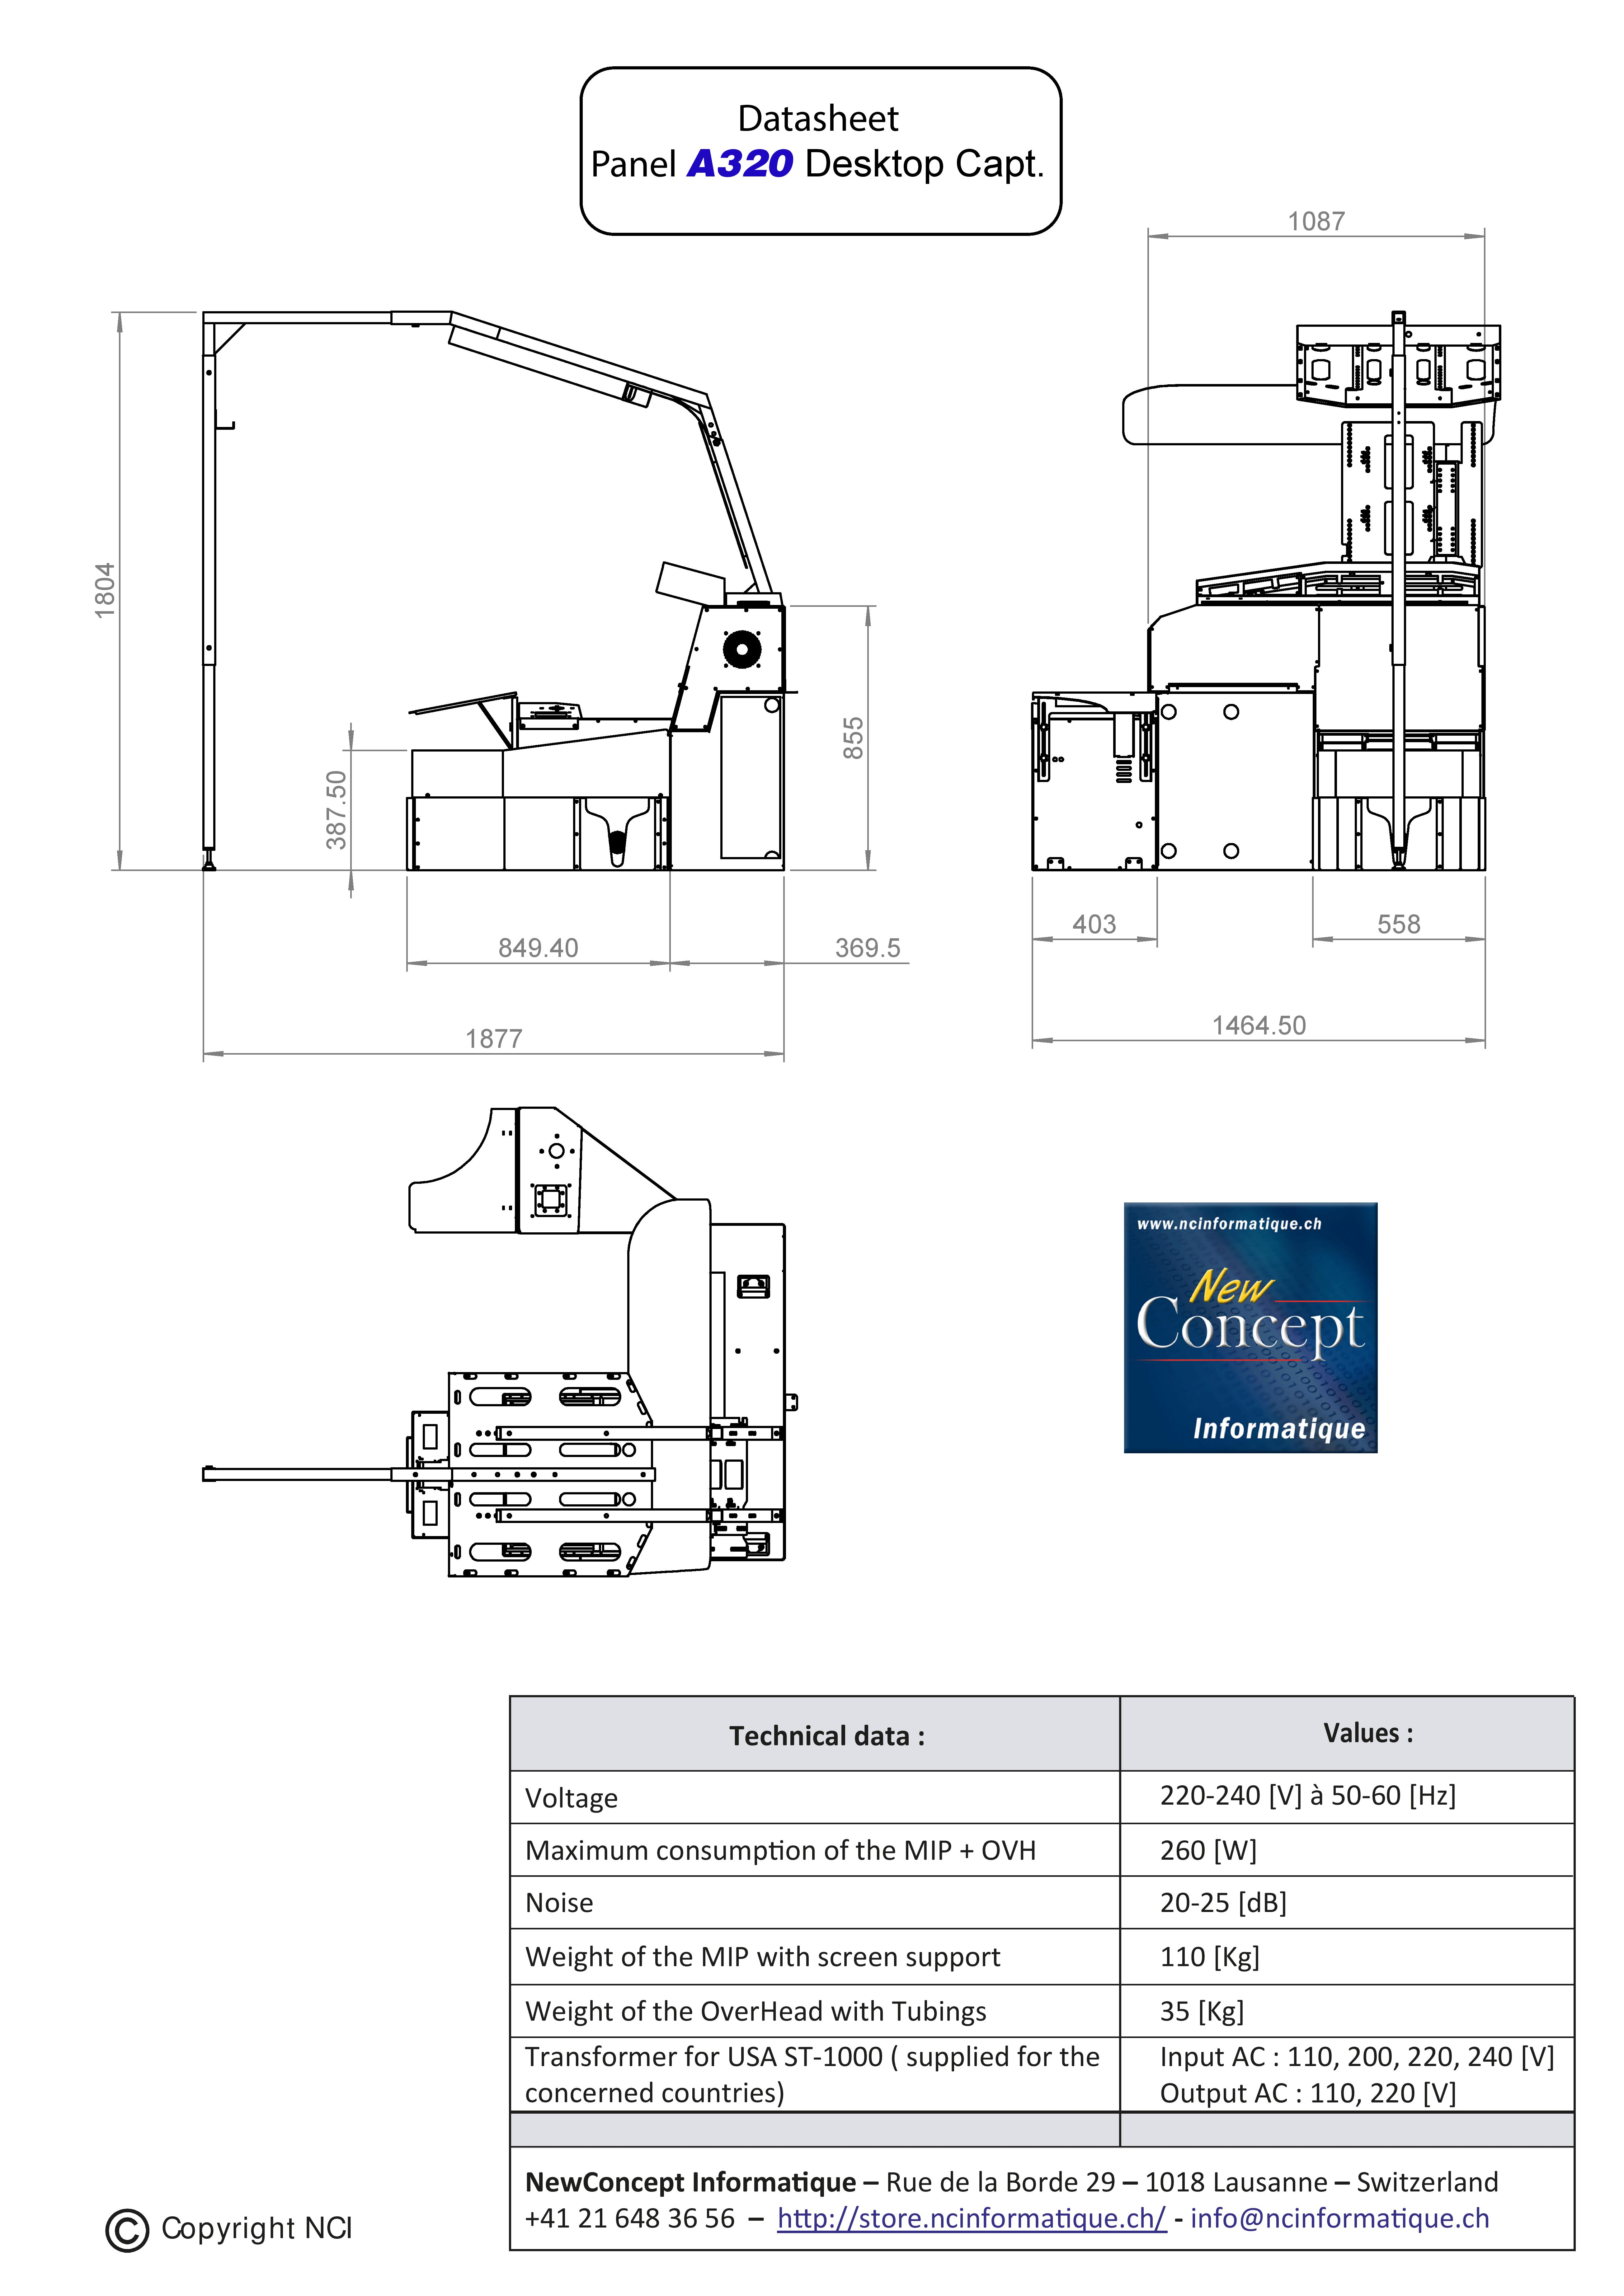 Pre order - Panel A320 Desktop Captain on